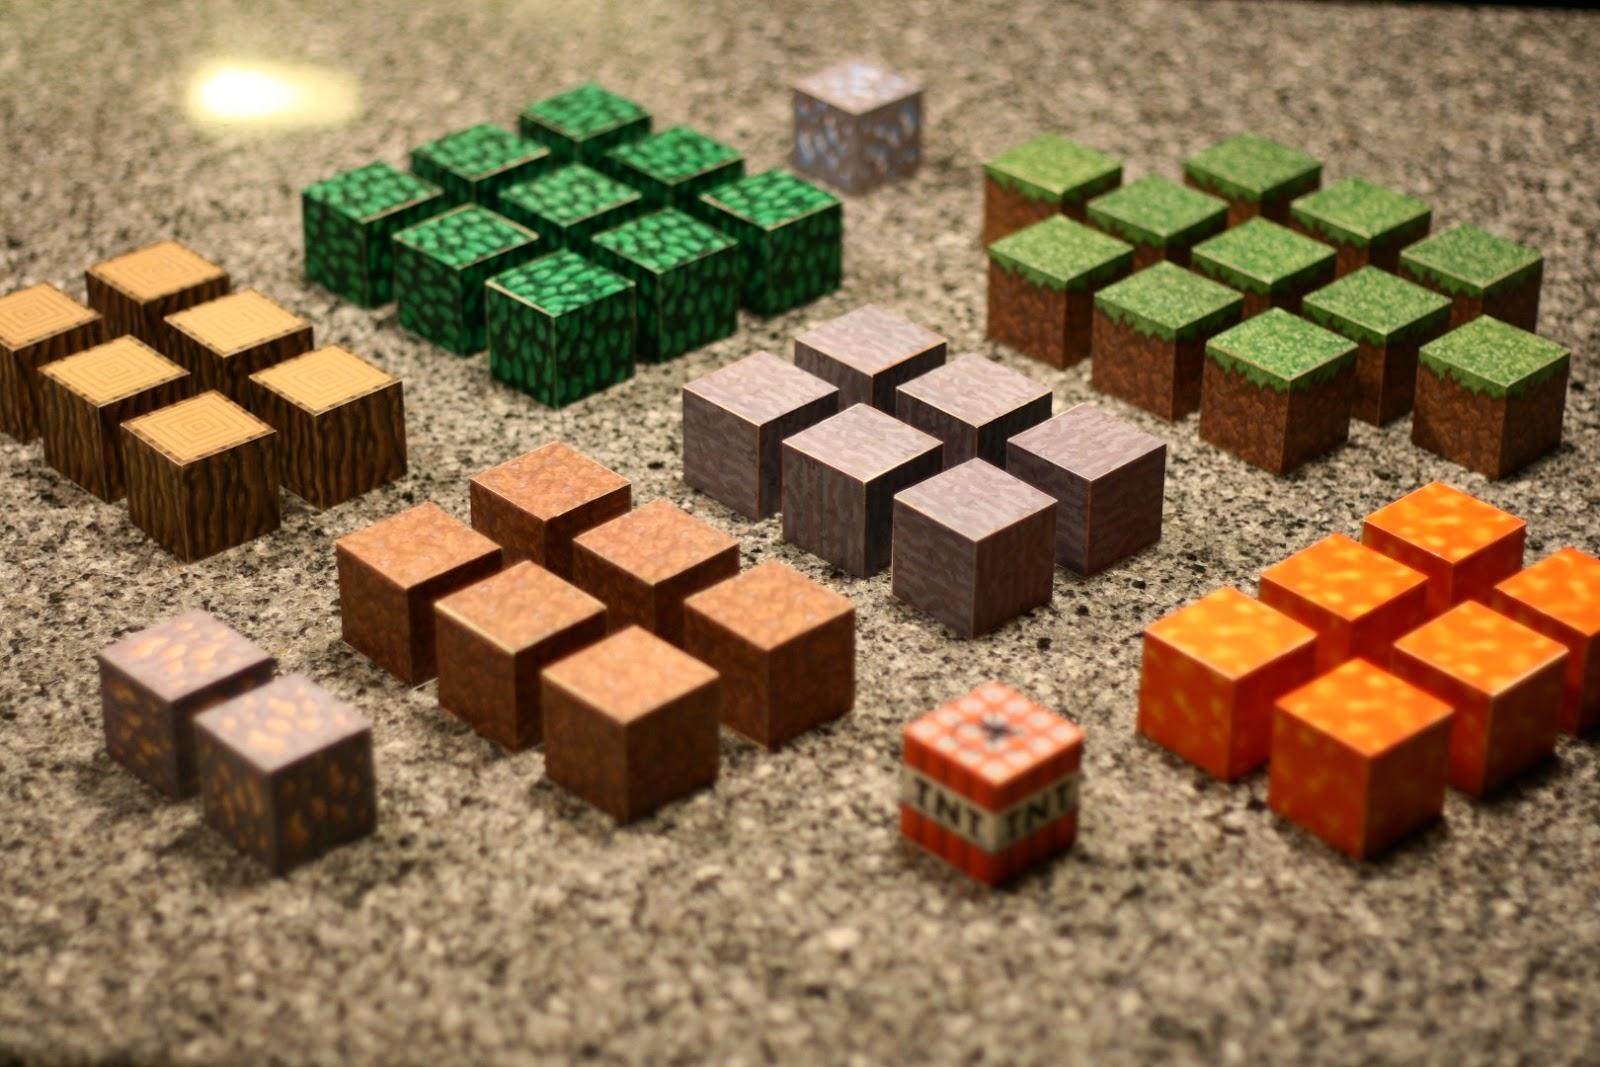 Life of Gregory D: DIY Wood Minecraft Blocks